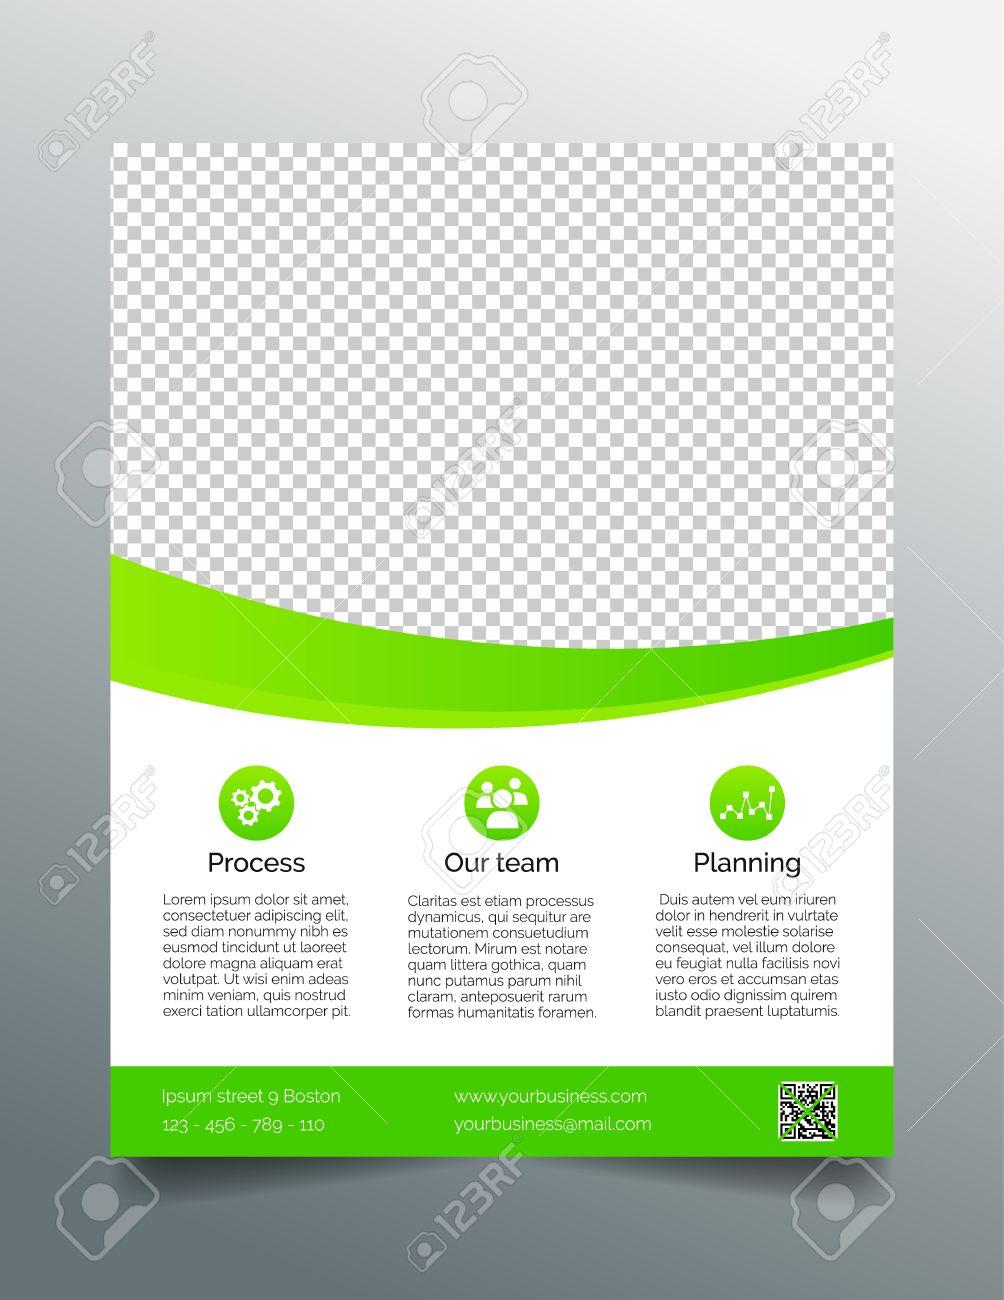 business flyer template simple sleek design in bright green business flyer template simple sleek design in bright green stock vector 39890479